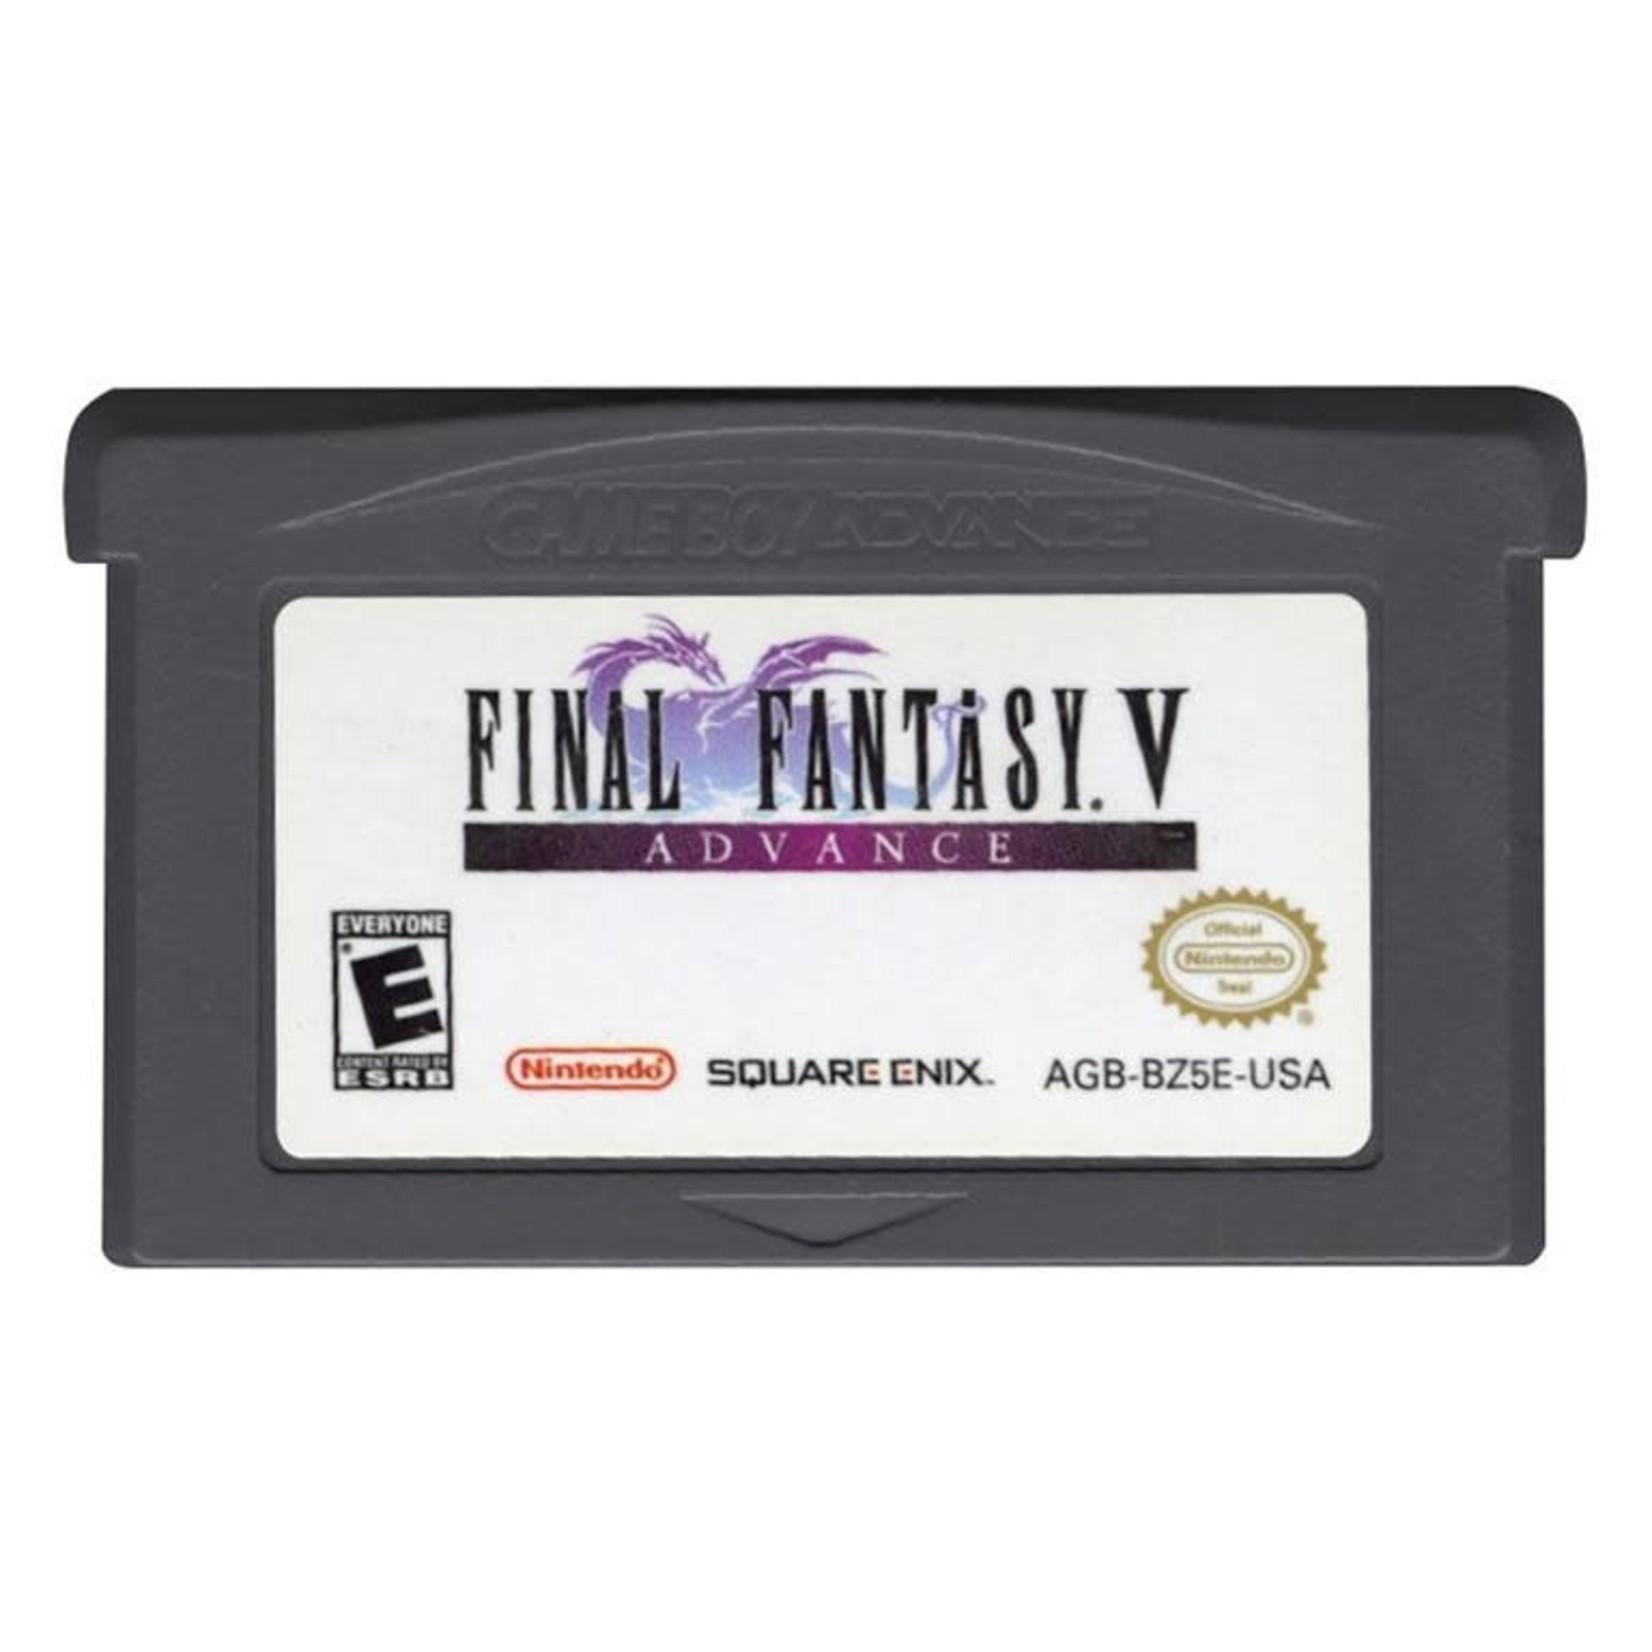 gbau-Final Fantasy V Advance (cartridge)